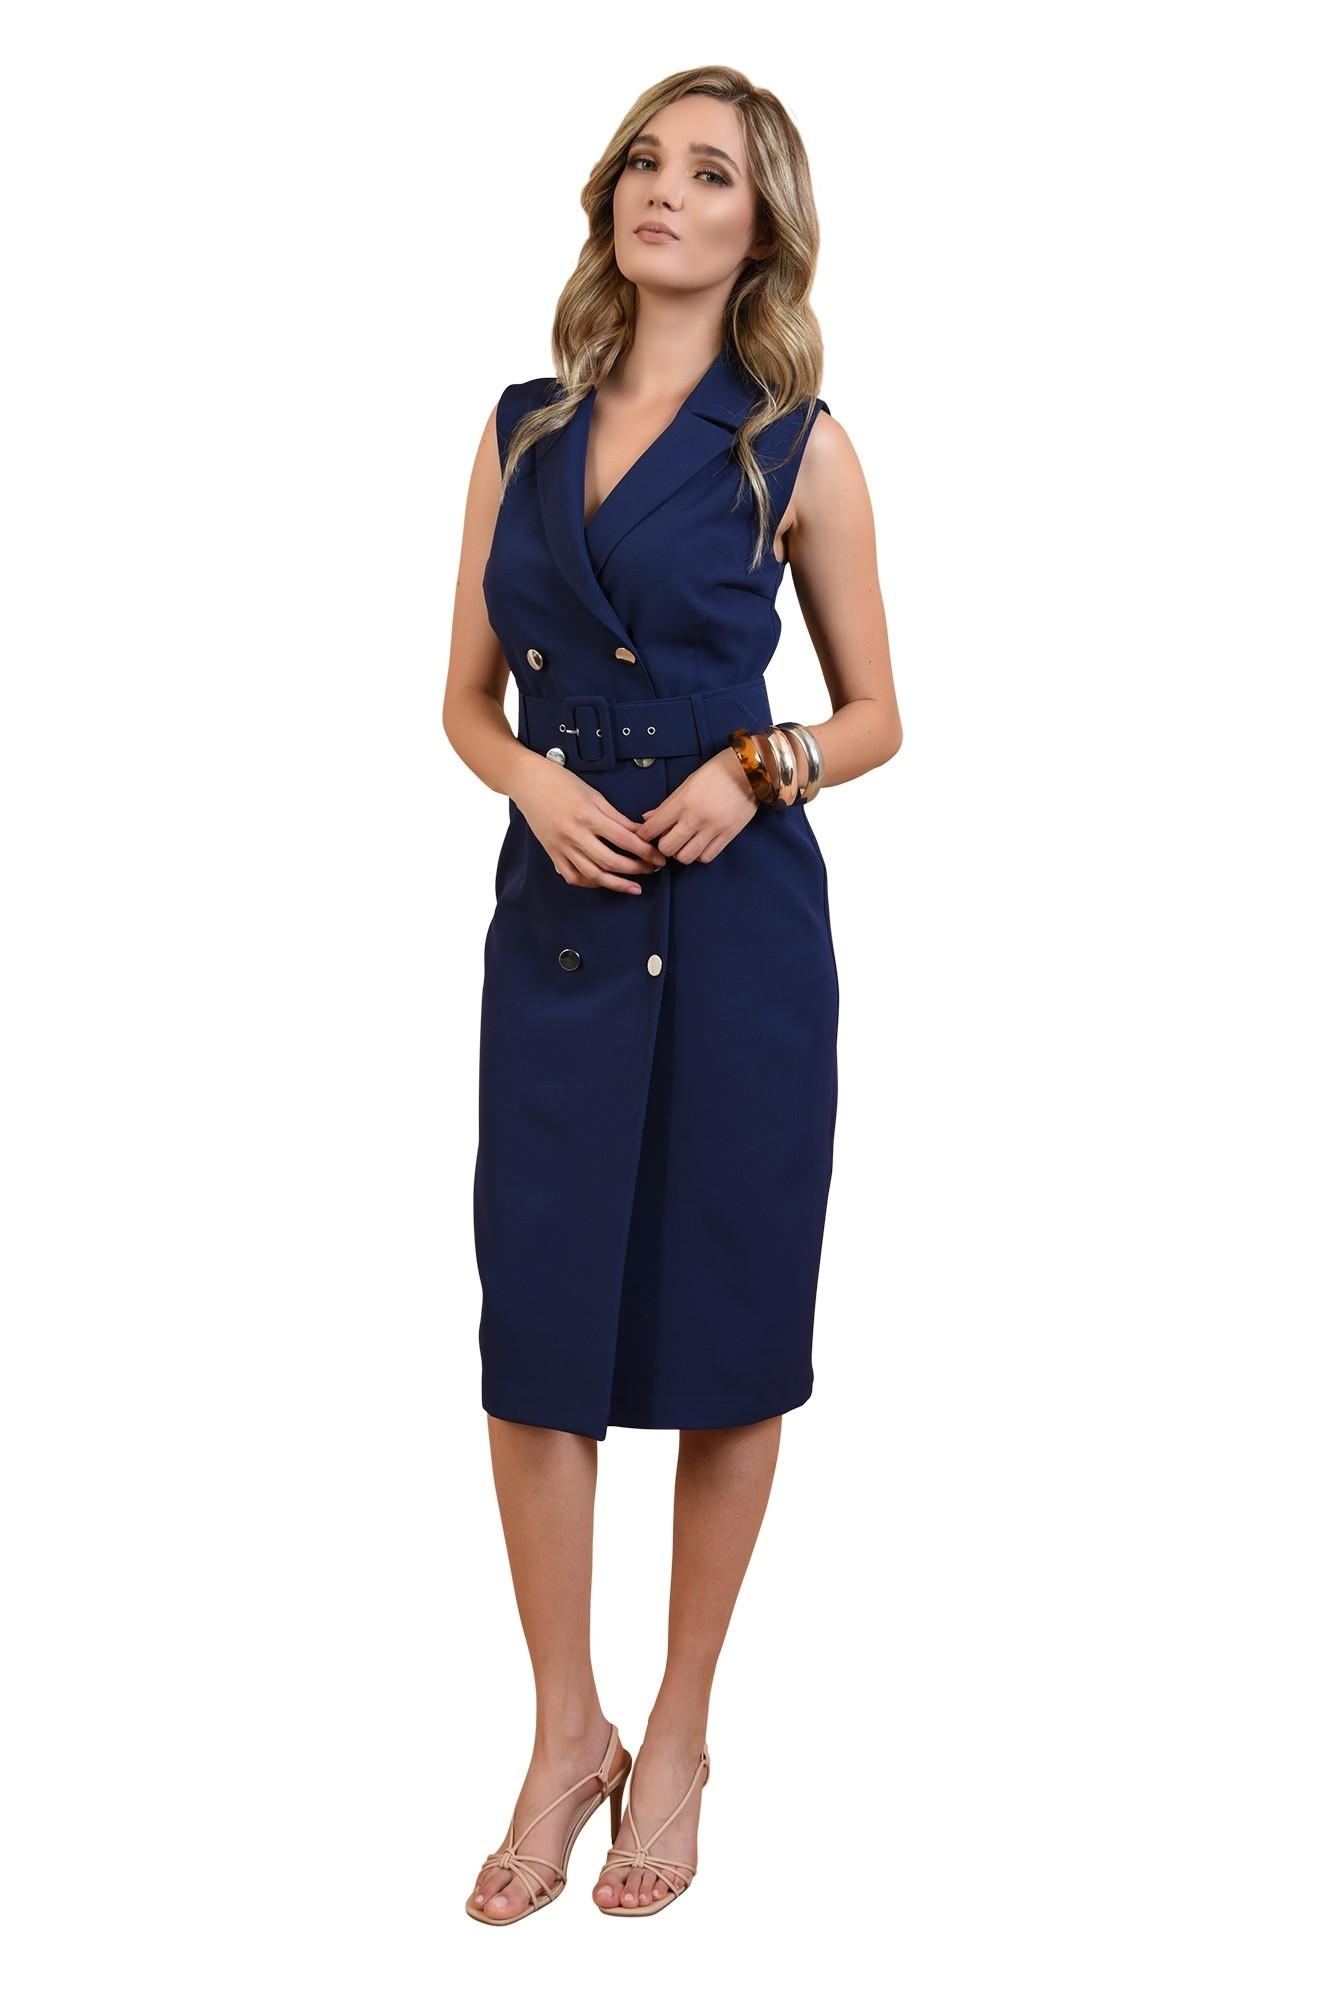 3 - 360 - rochie conica, bleumarin, cu nasturi, stil sacou, Poema